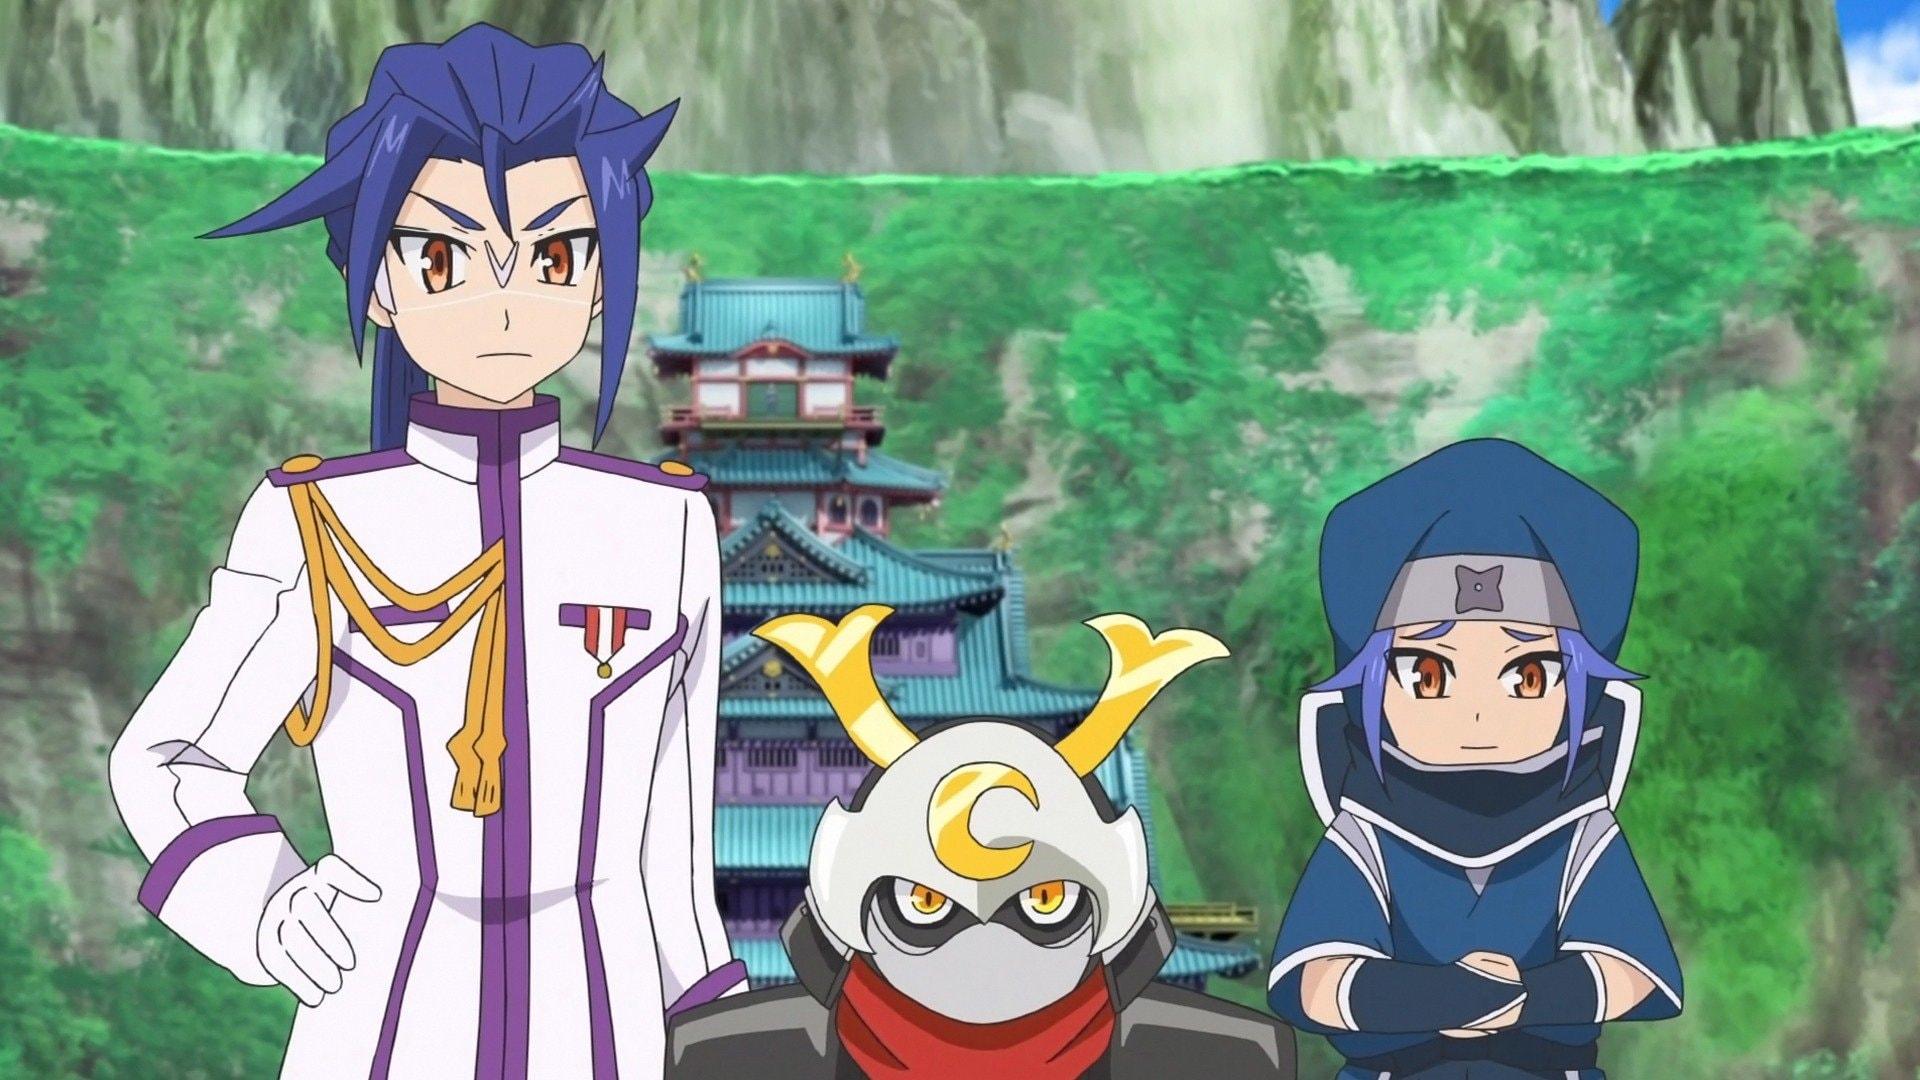 Invincible Swordsman! Shosetsu Kirisame!